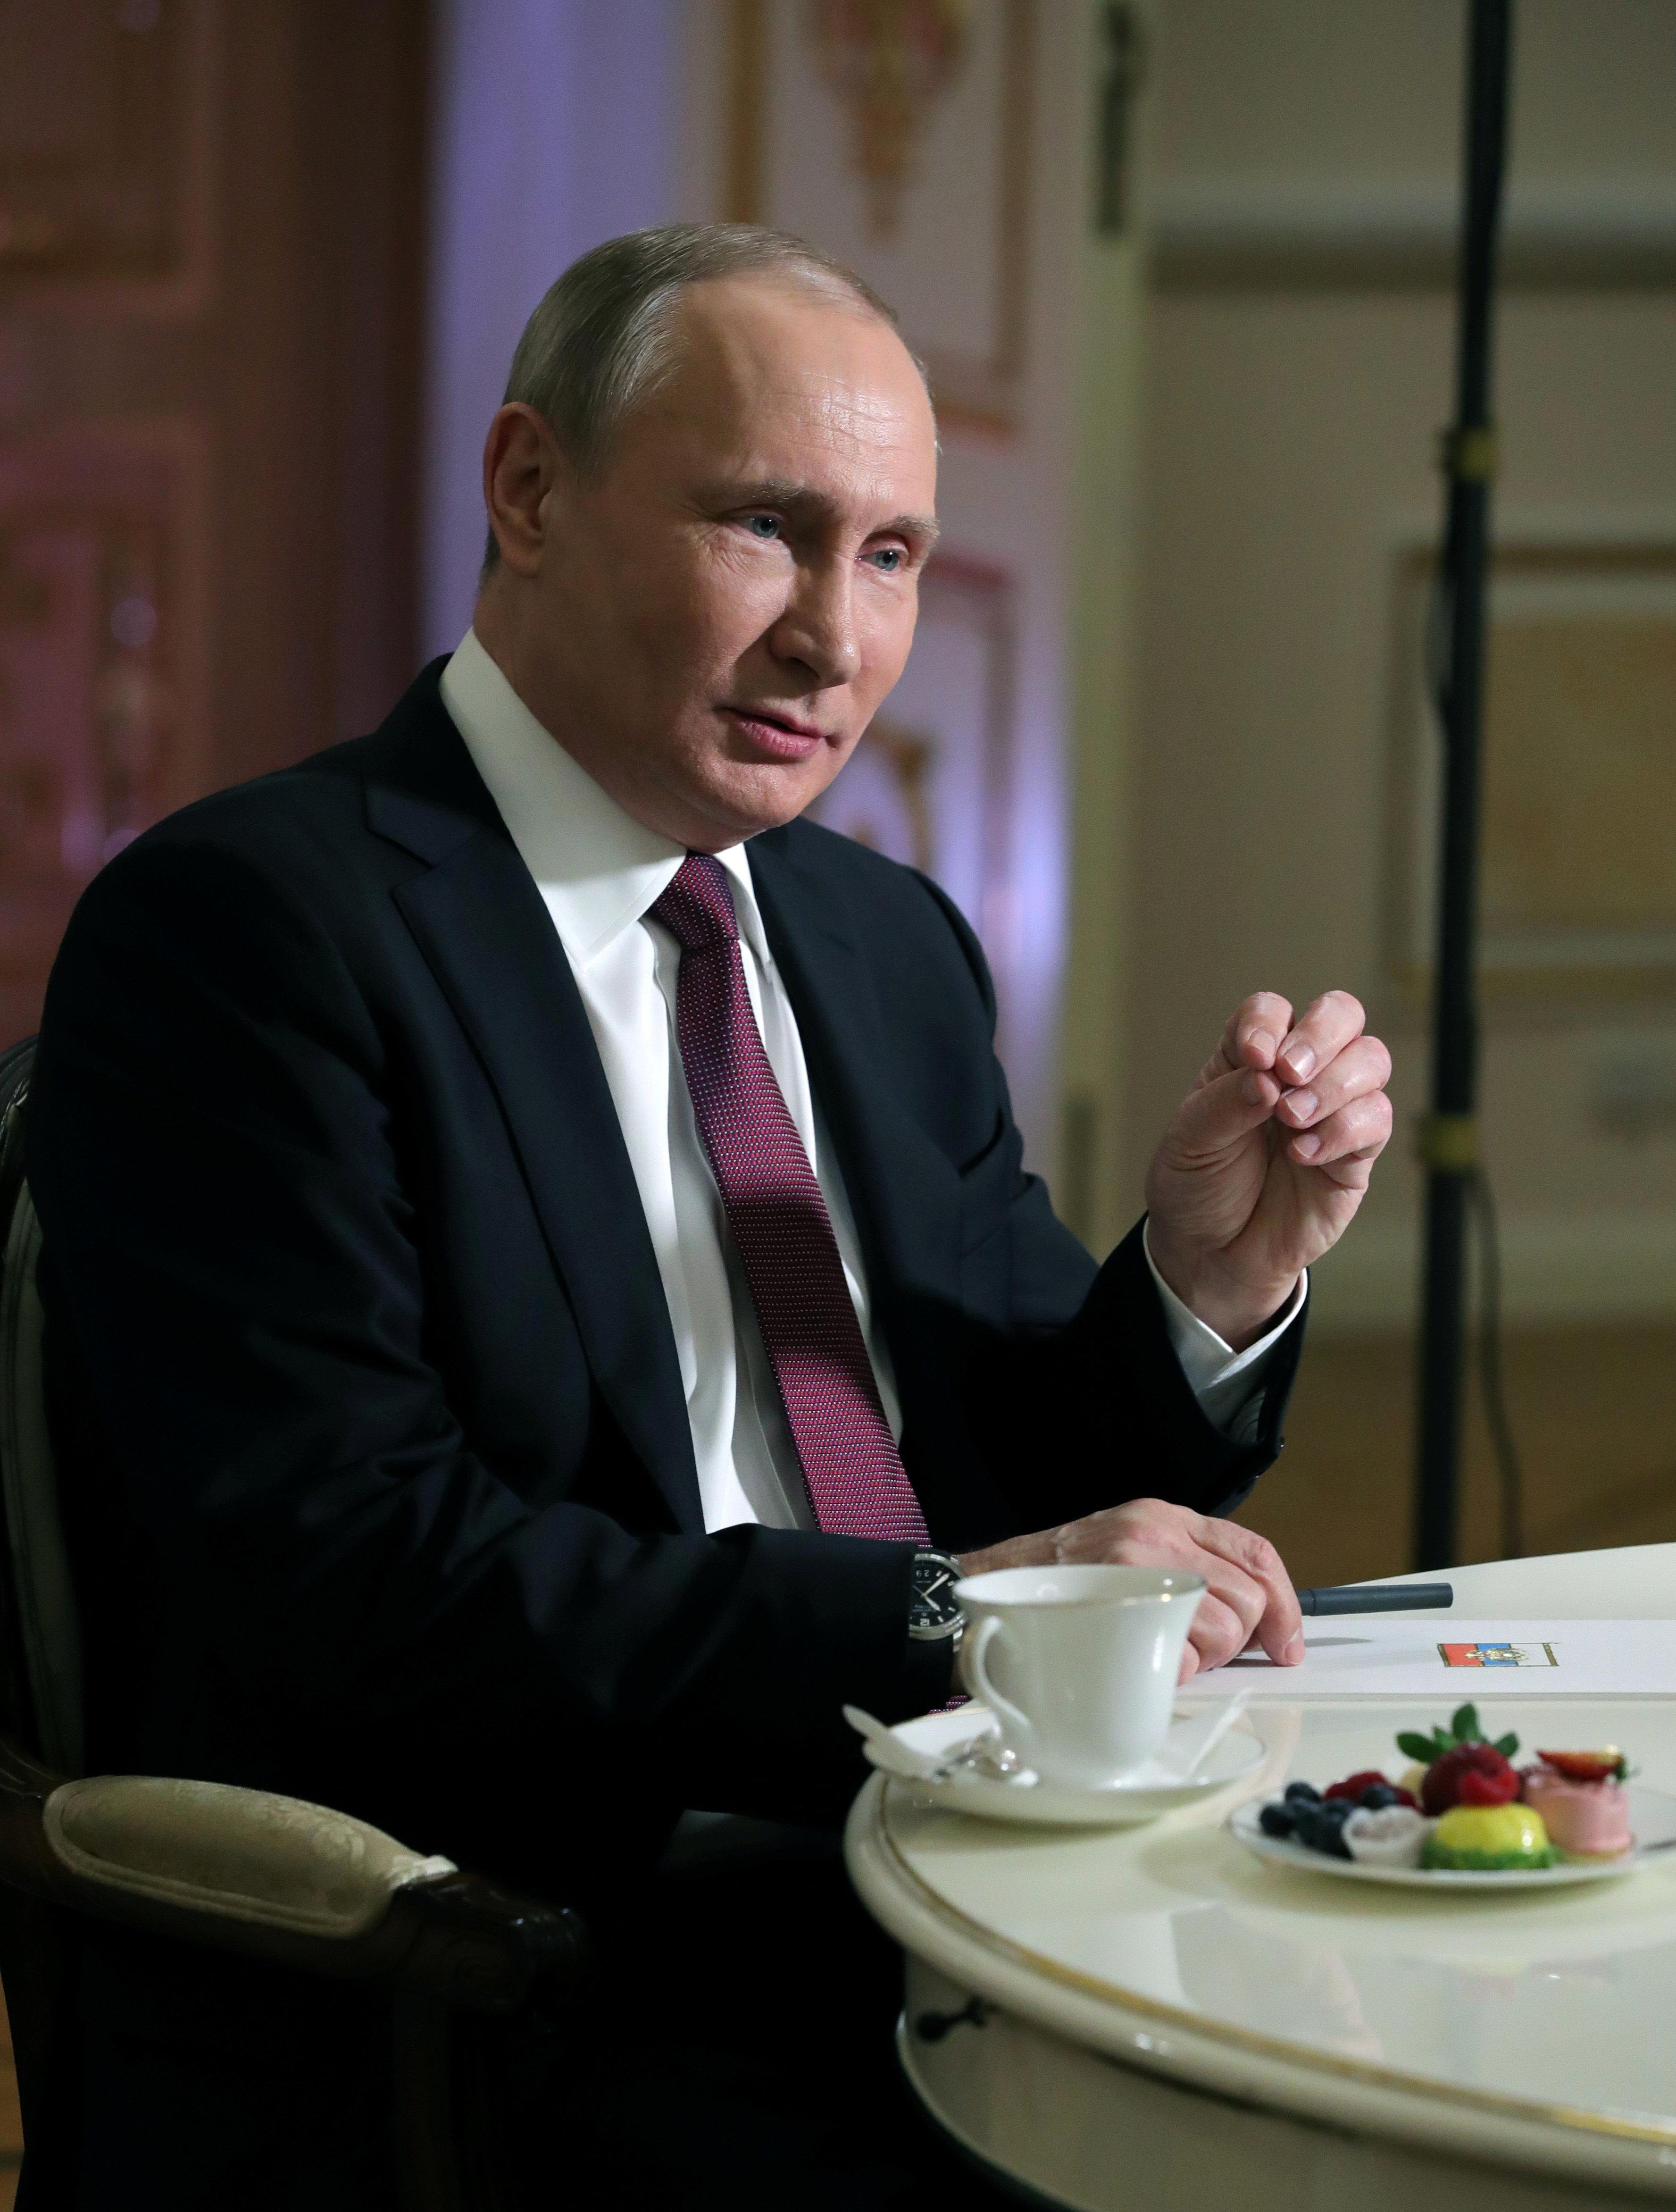 Vladimir Putin Blames U.S. Election Interference On 'Jews,'